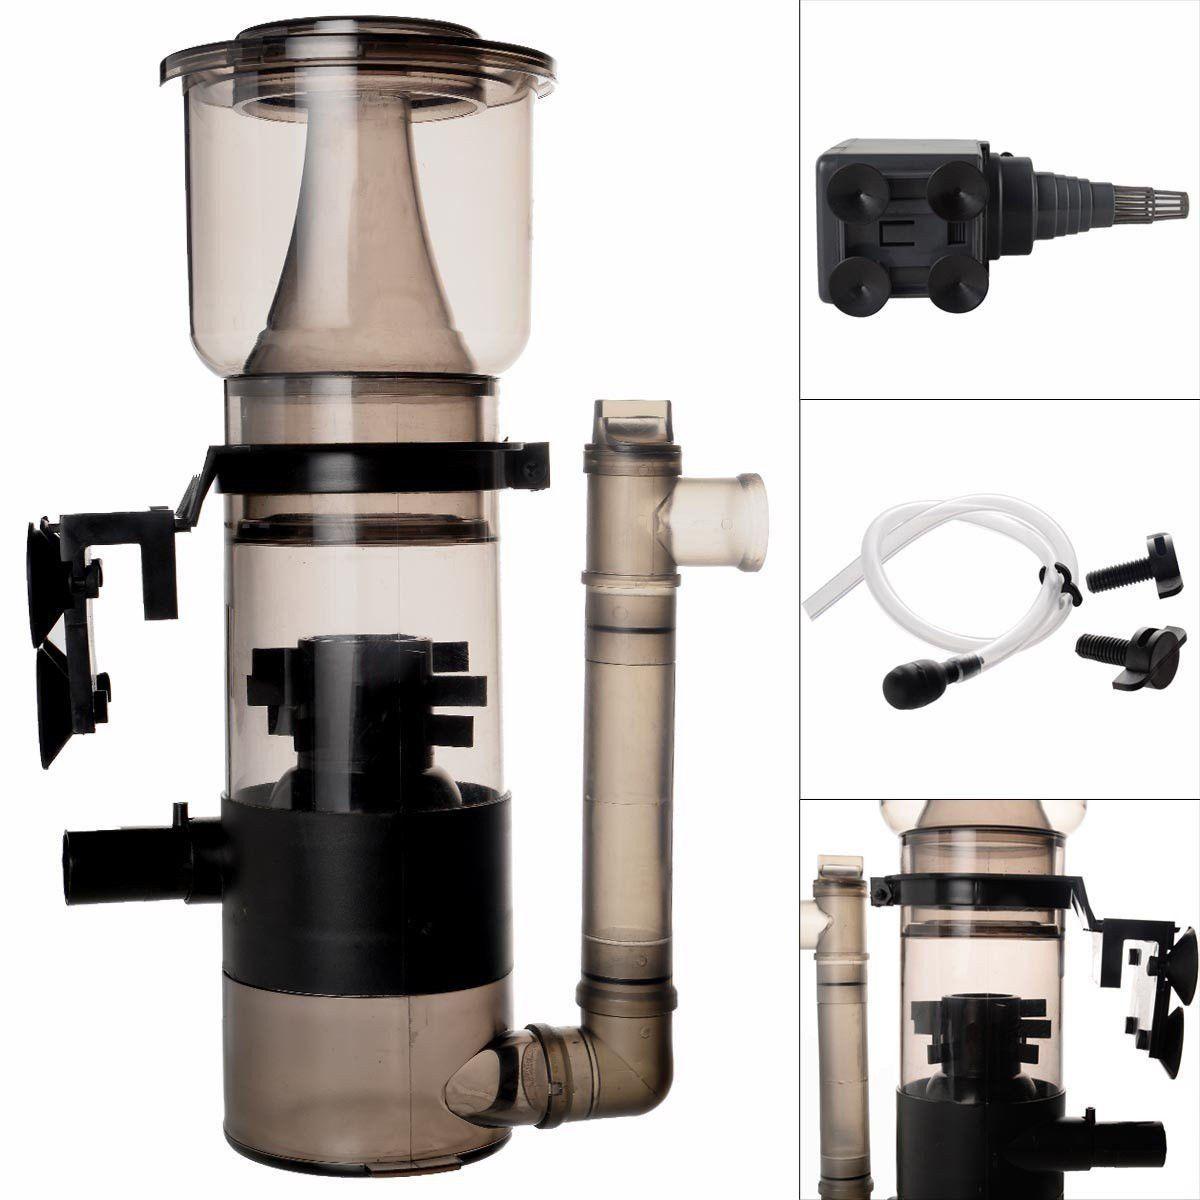 Aquarium fish tank shop - Amazon Com Safstar Aquarium Protein Skimmer With 530gph Pump Filter Fish Tank Powerhead